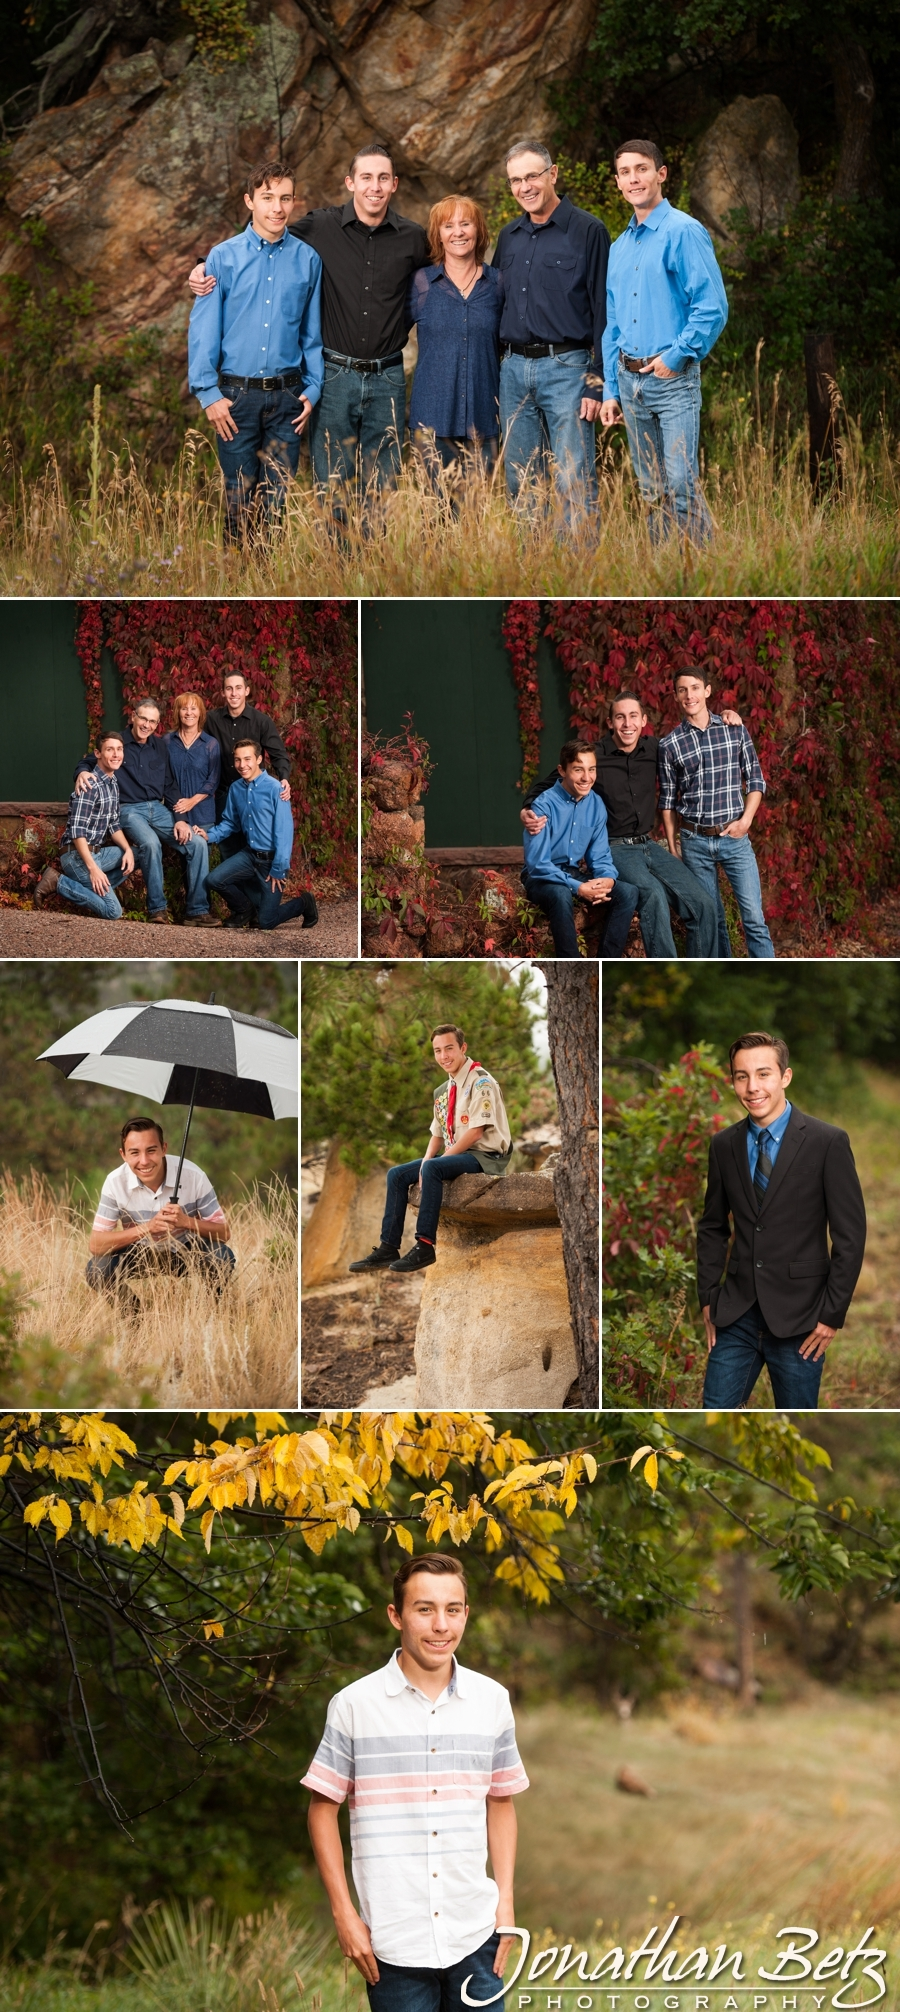 Family portraits high school senior photographer colorado springs Jonathan Betz Photography 1